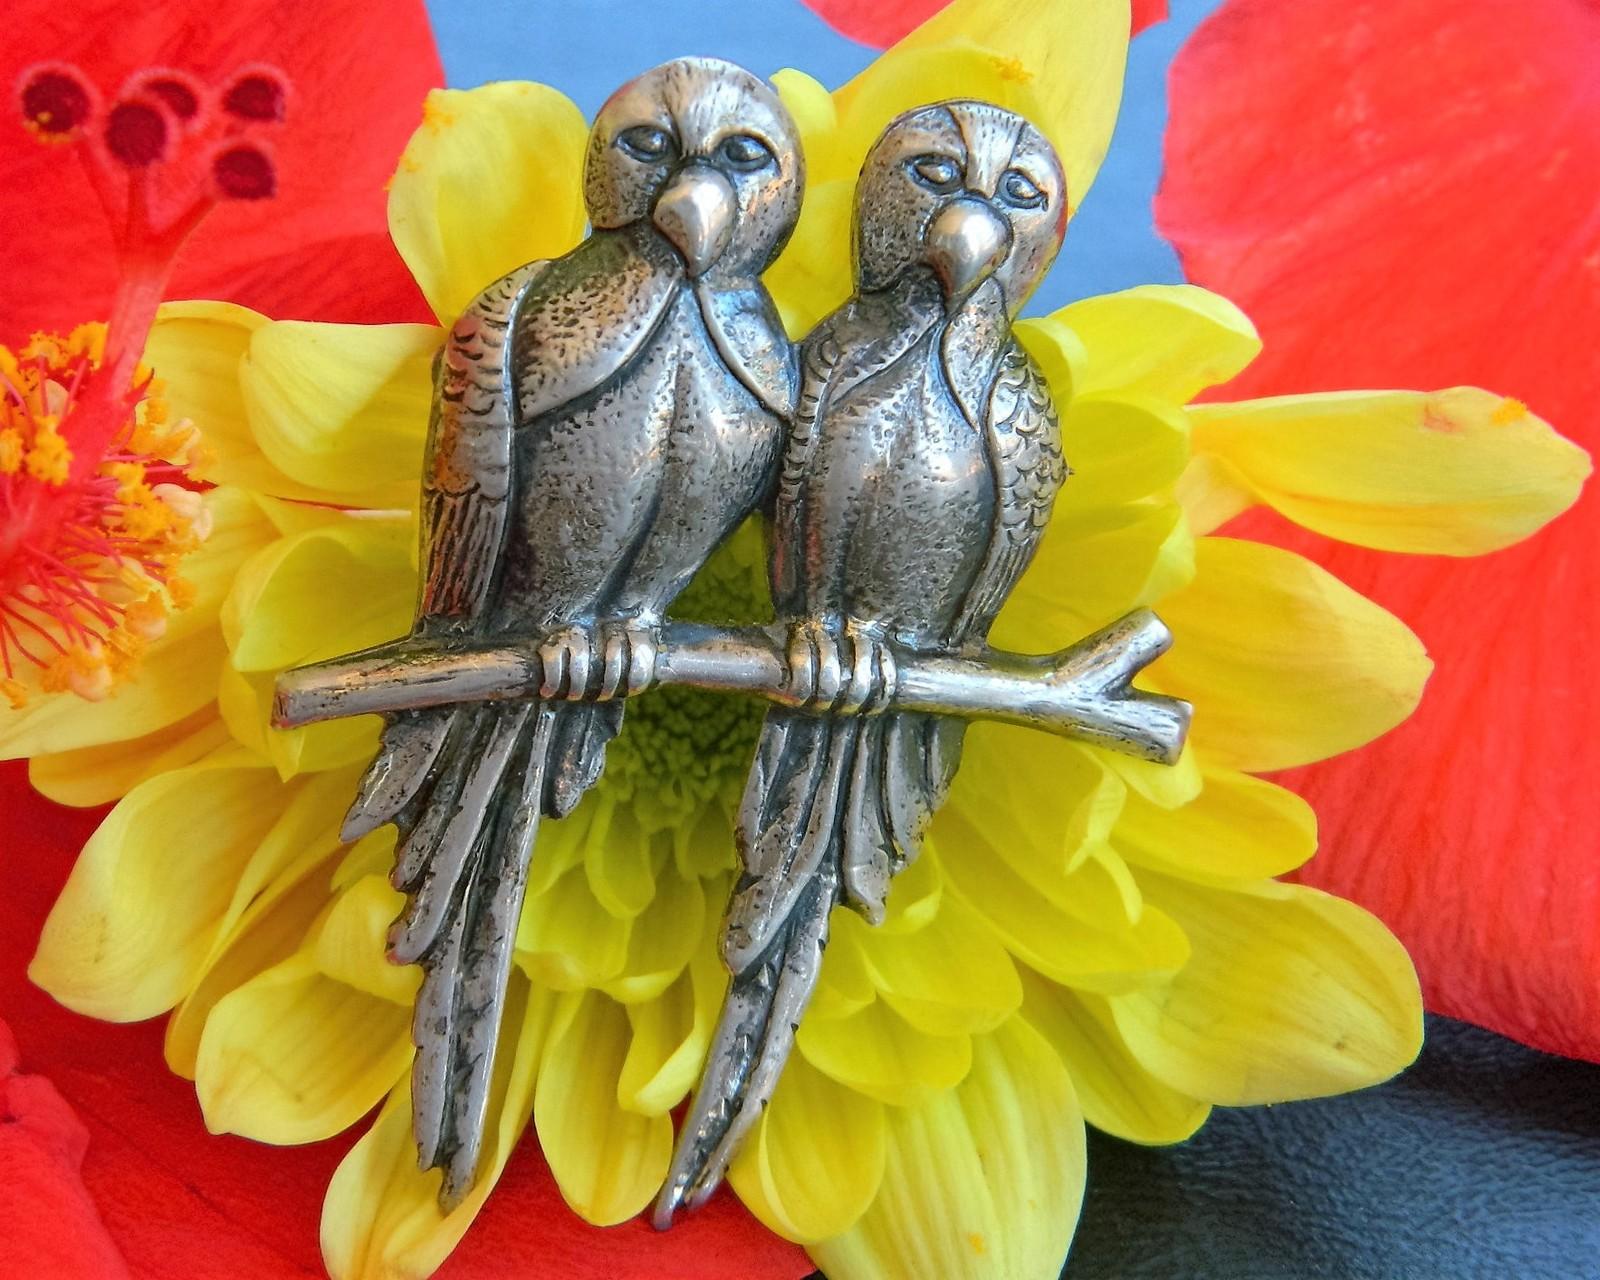 Vintage parrots brooch pin 2 lovebirds branch sterling silver figural